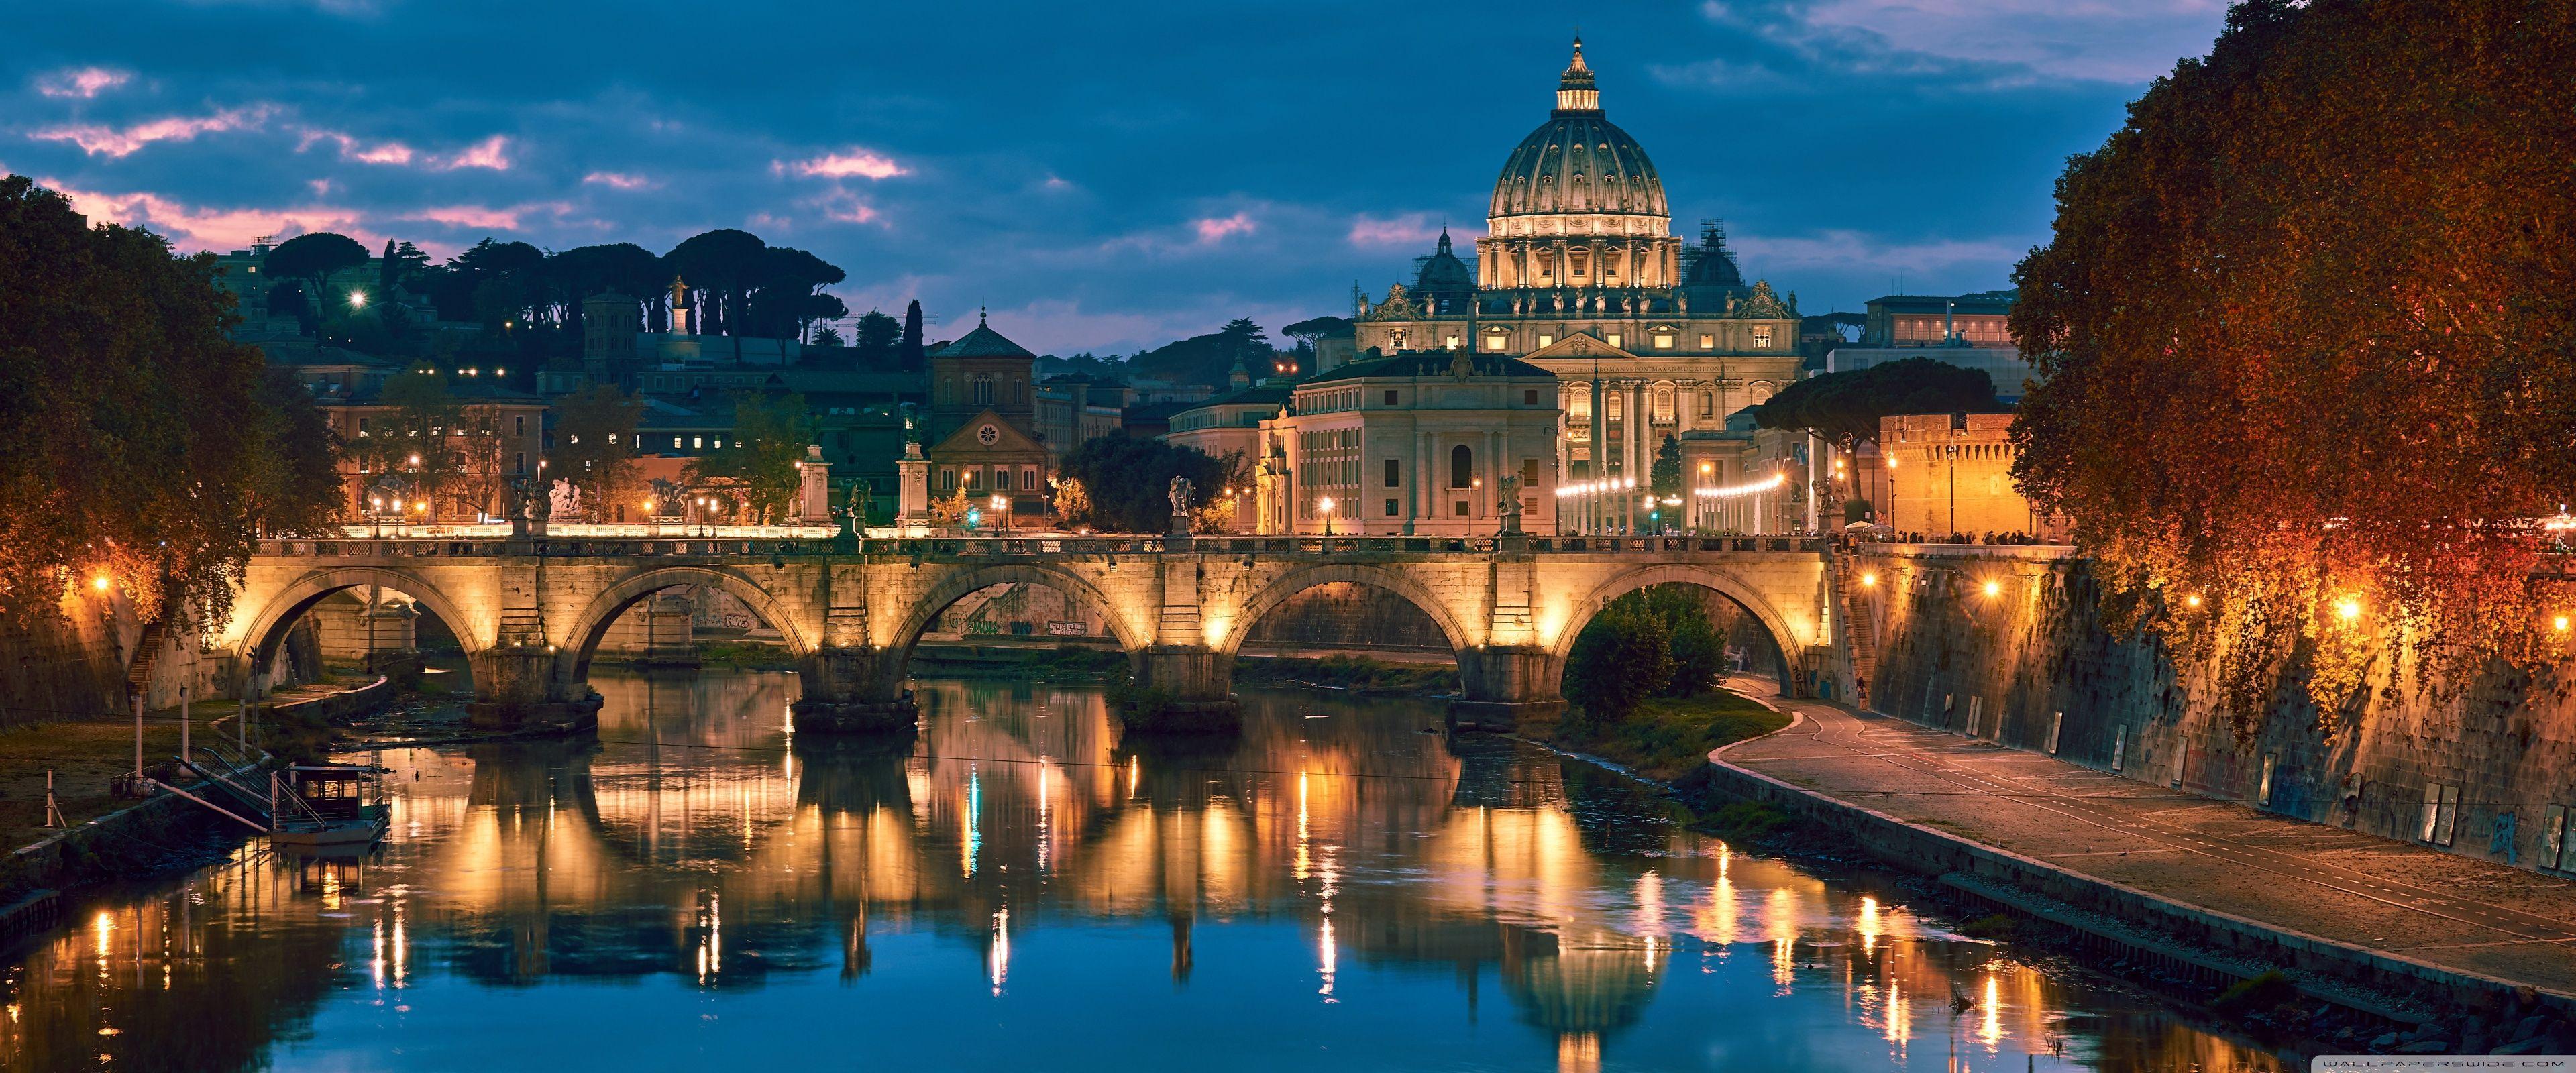 Ponte Santangelo Rome Italy 3840 X 1600 In 2020 Rome Italy Rome City Rome